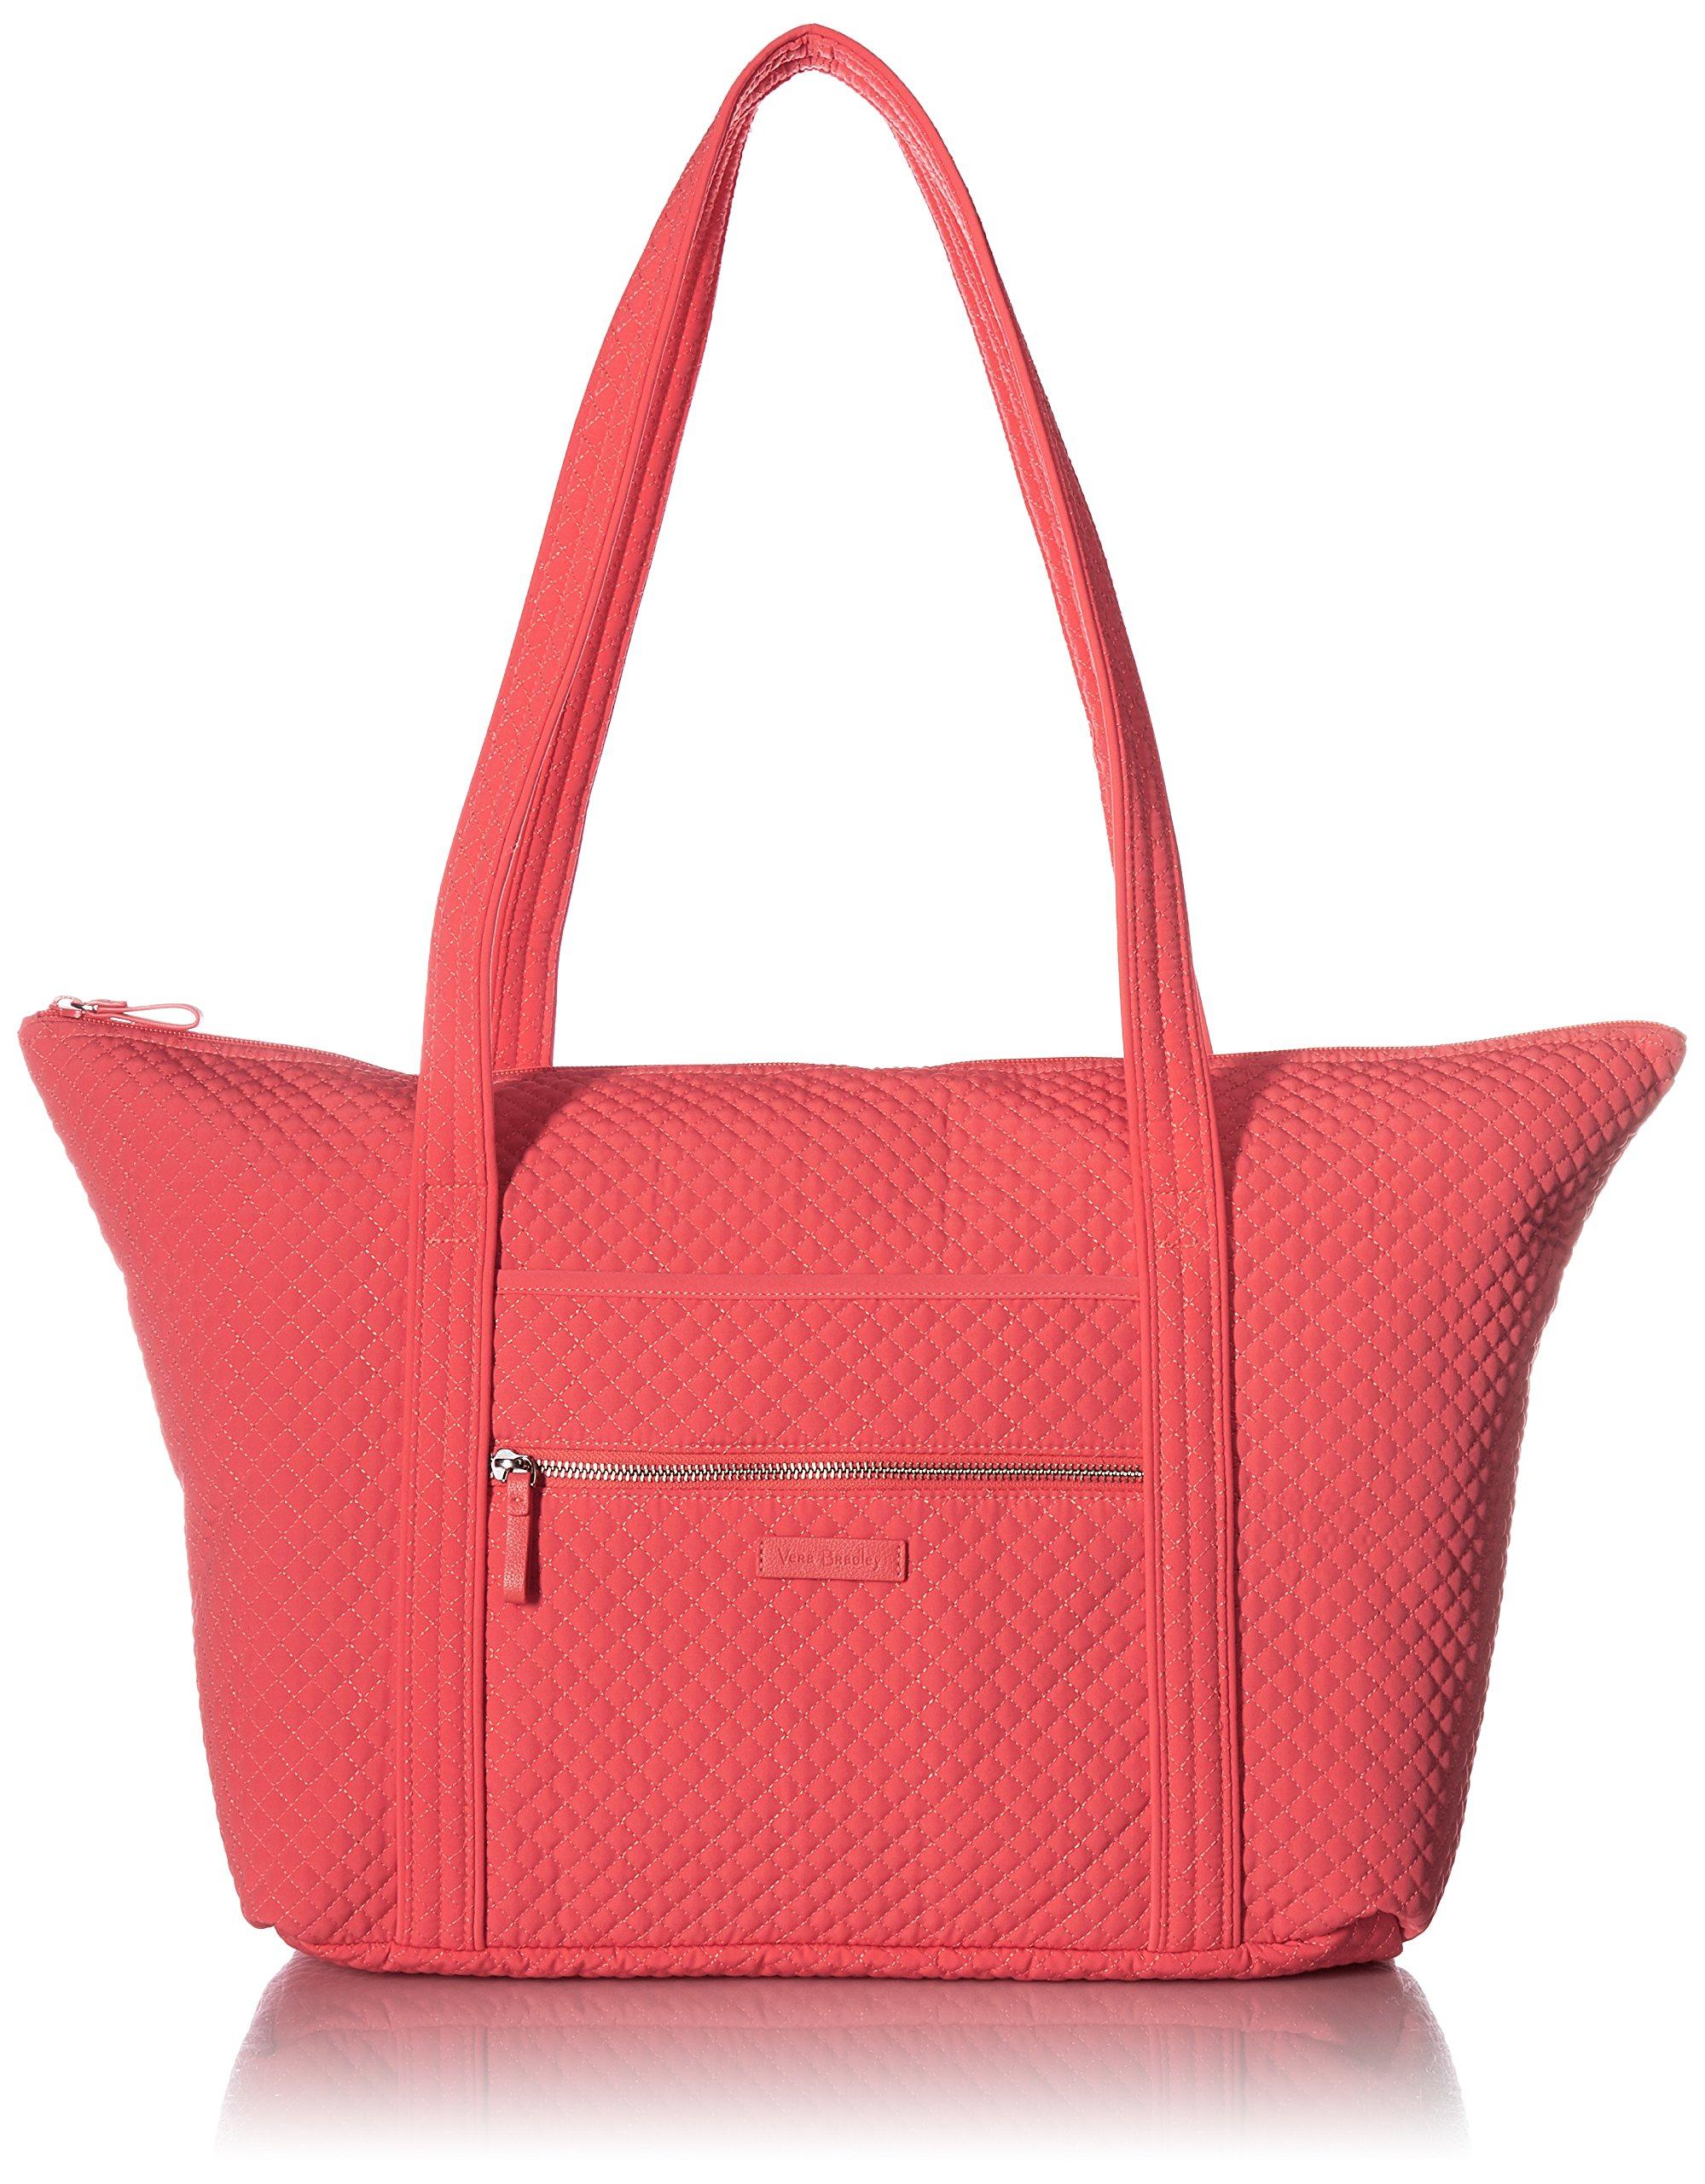 Vera Bradley Iconic Miller Travel Bag, Coral Reef